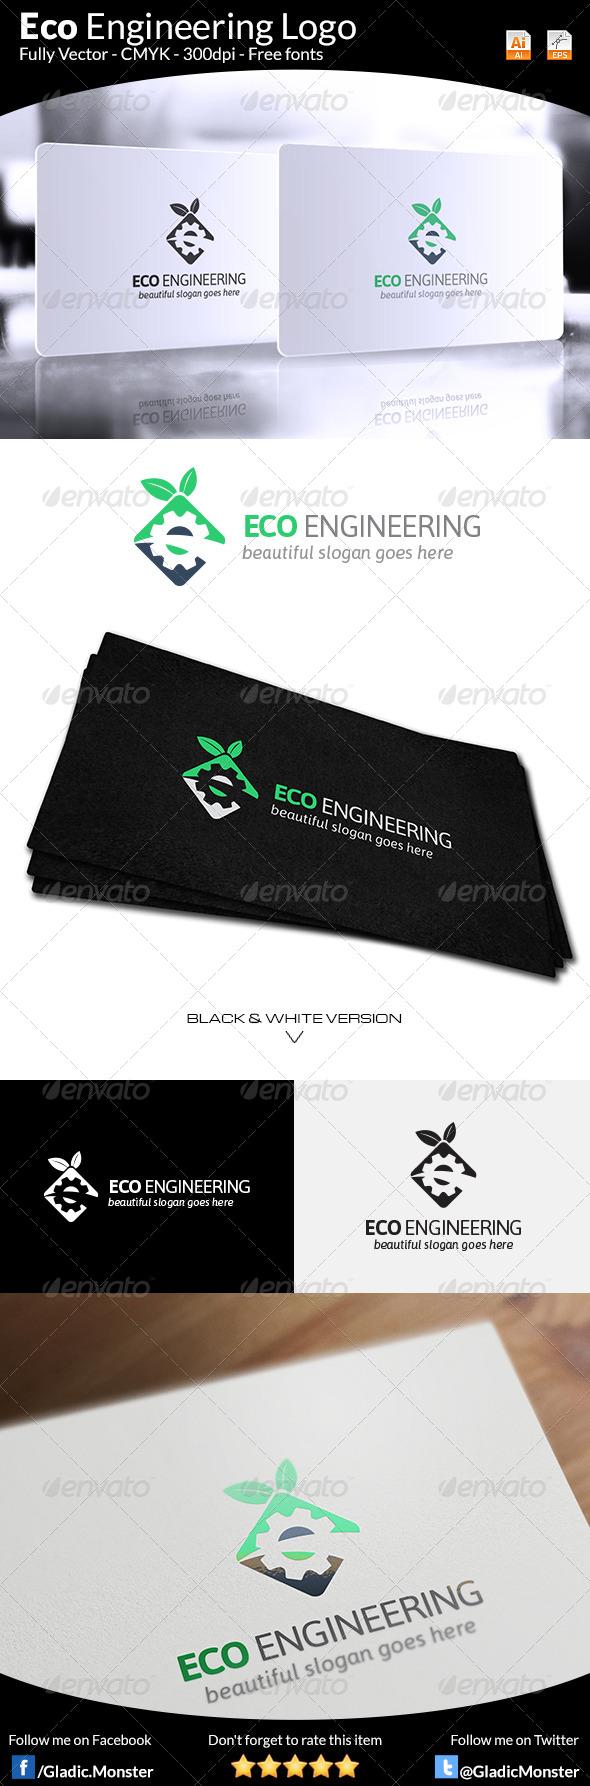 GraphicRiver Eco Engineering Logo 7783831